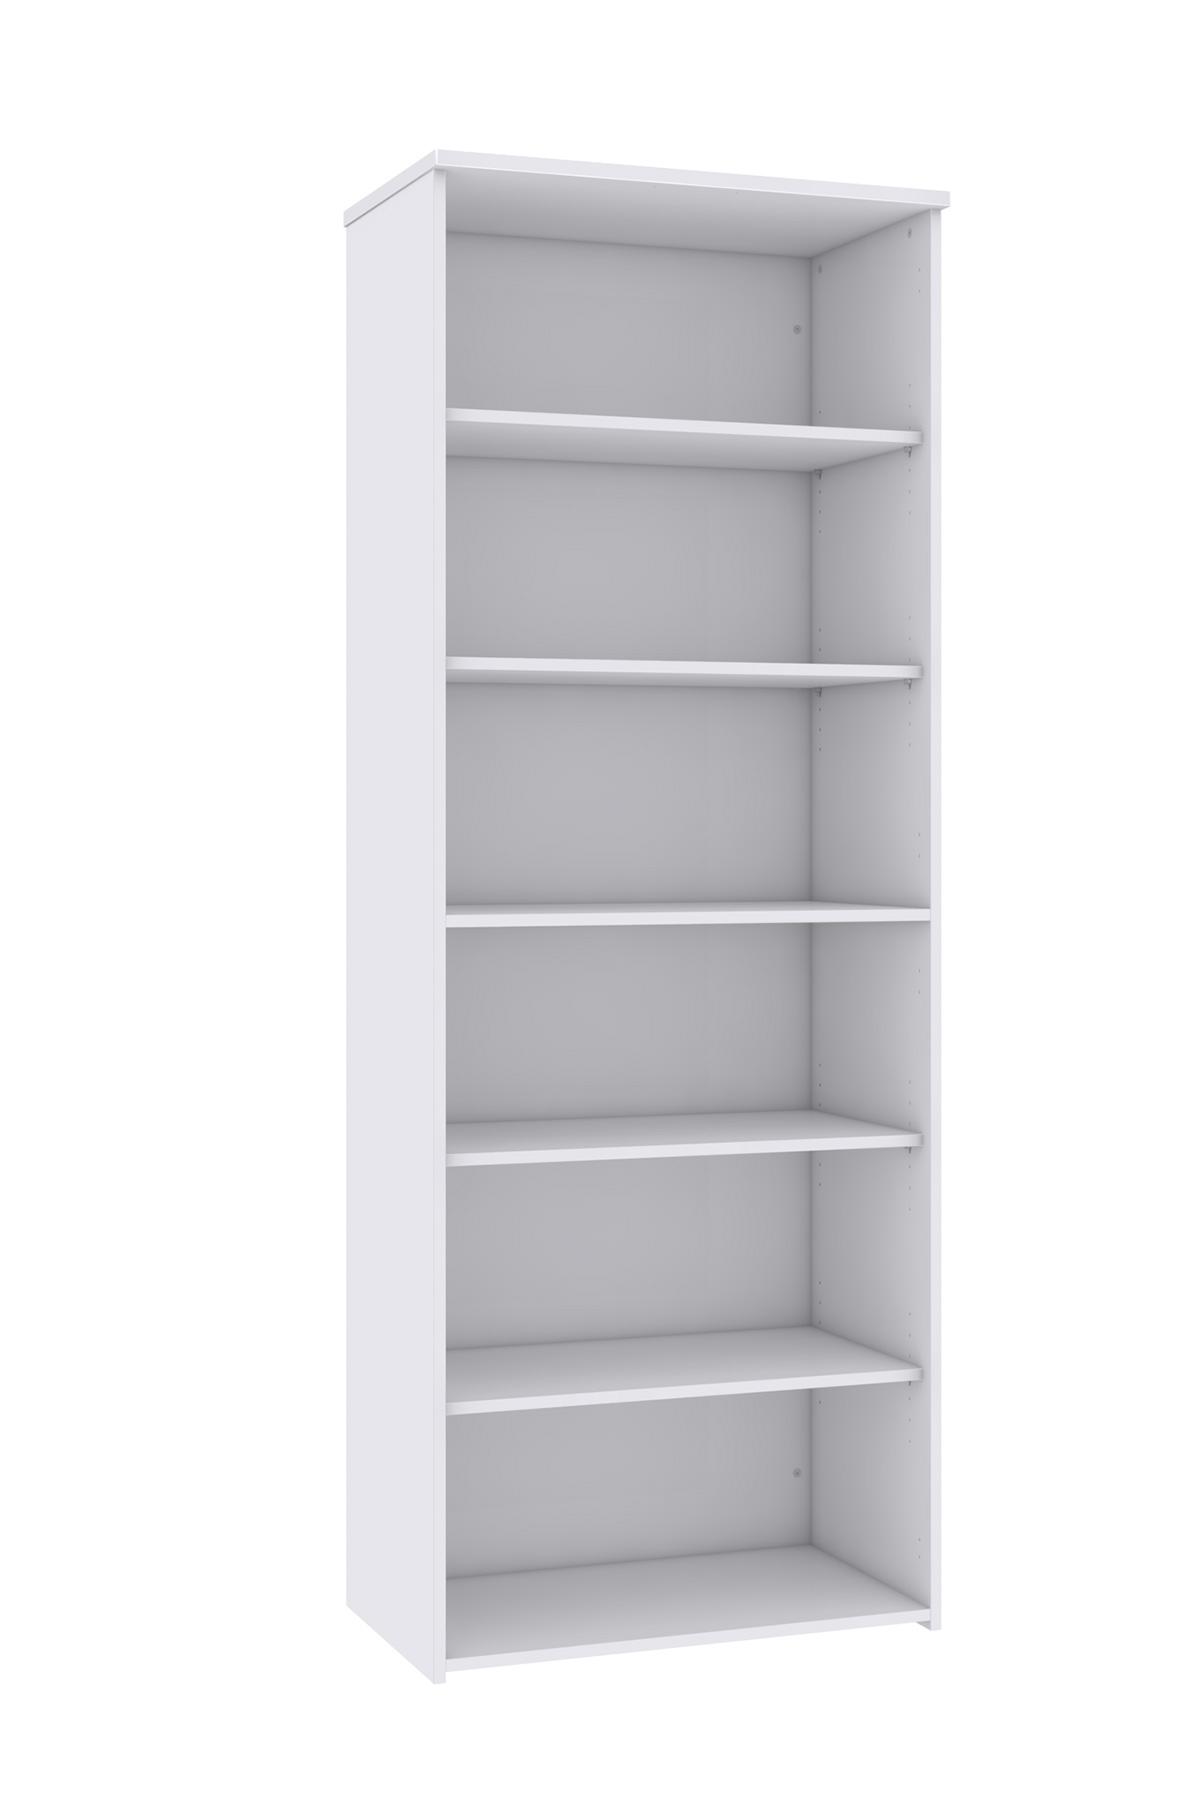 2140 Bookcase - Beech